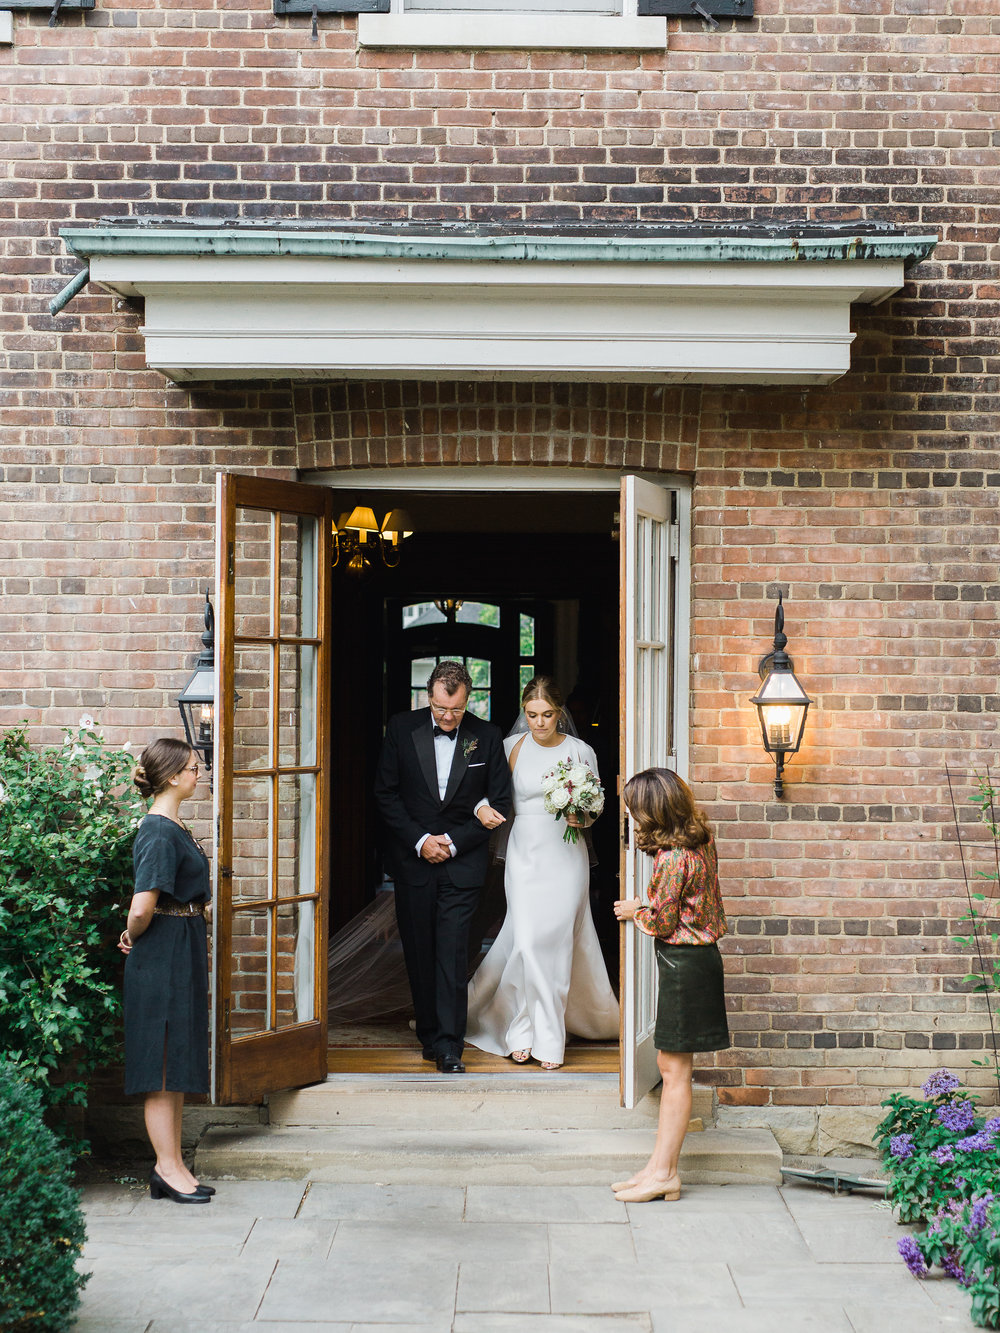 0426-Geneva-Ian-Wedding-Toronto Golf Club-When He Found Her-TorontoPhotographer.jpg